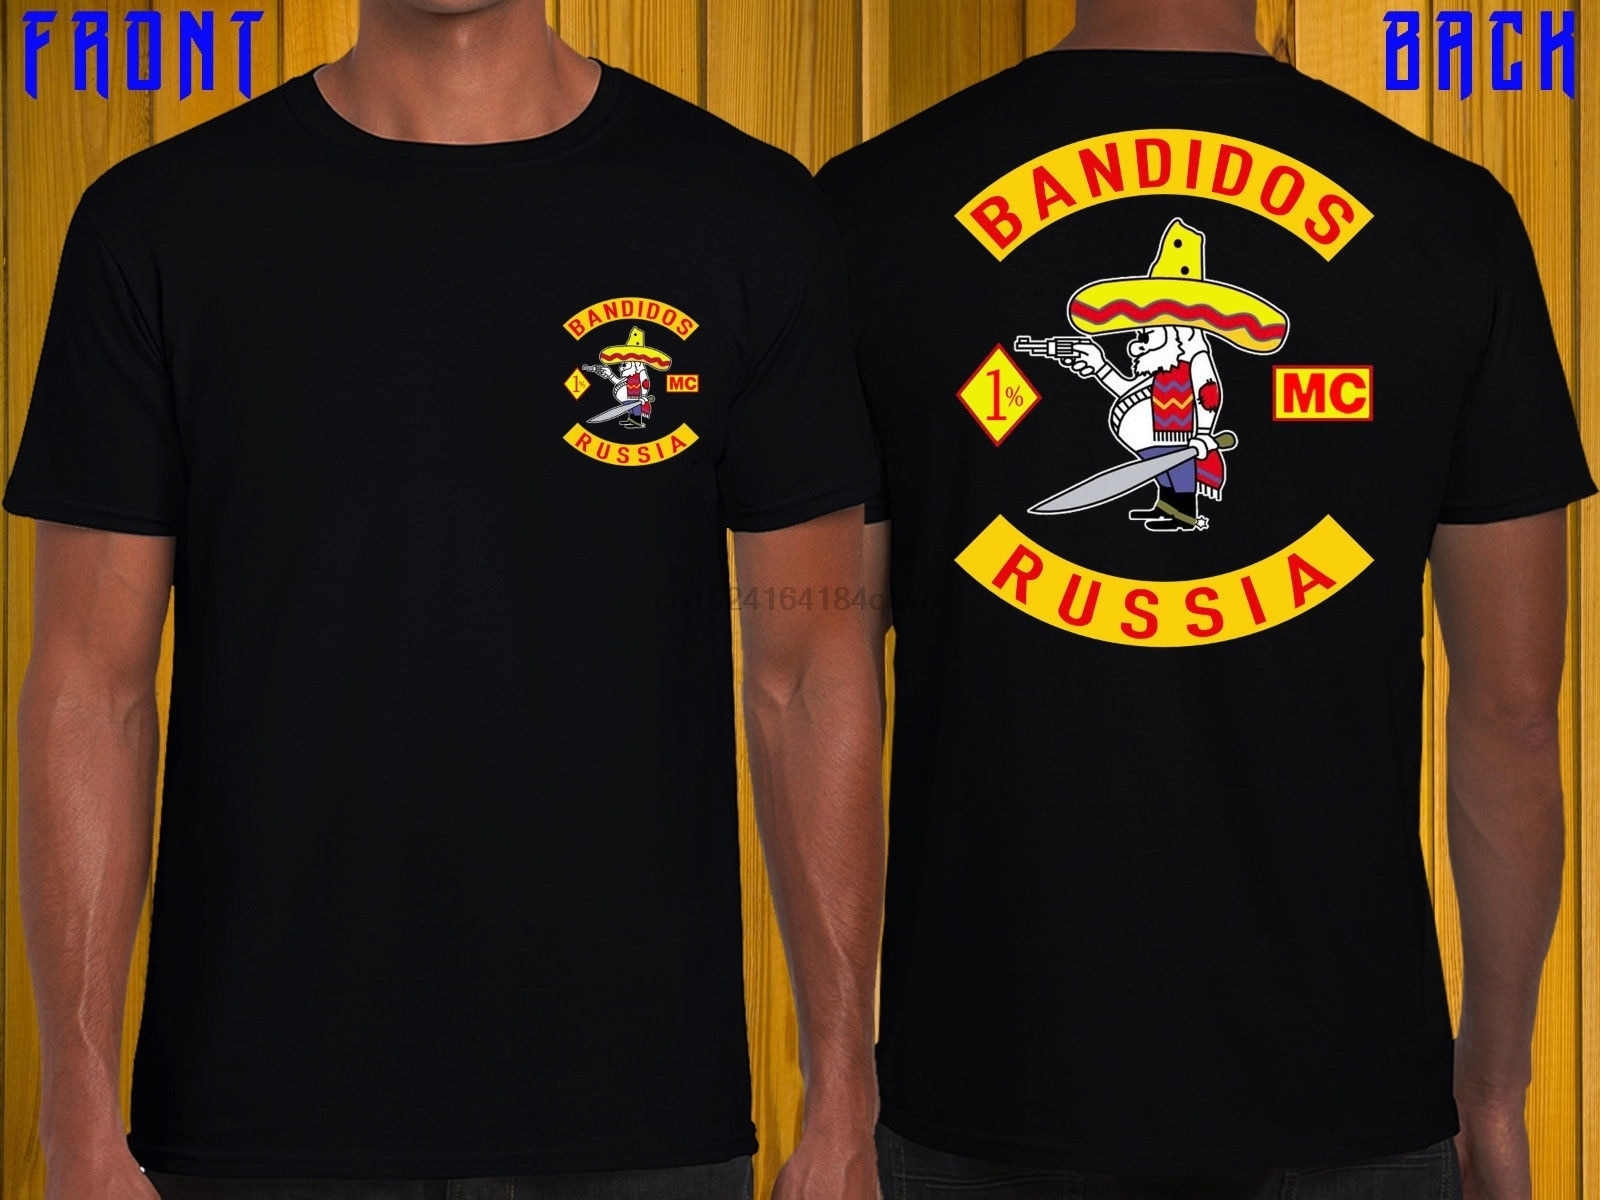 Bandidos Russland Mc T Shirt Schwarz russland Bandidos Motorclub T S-3xl